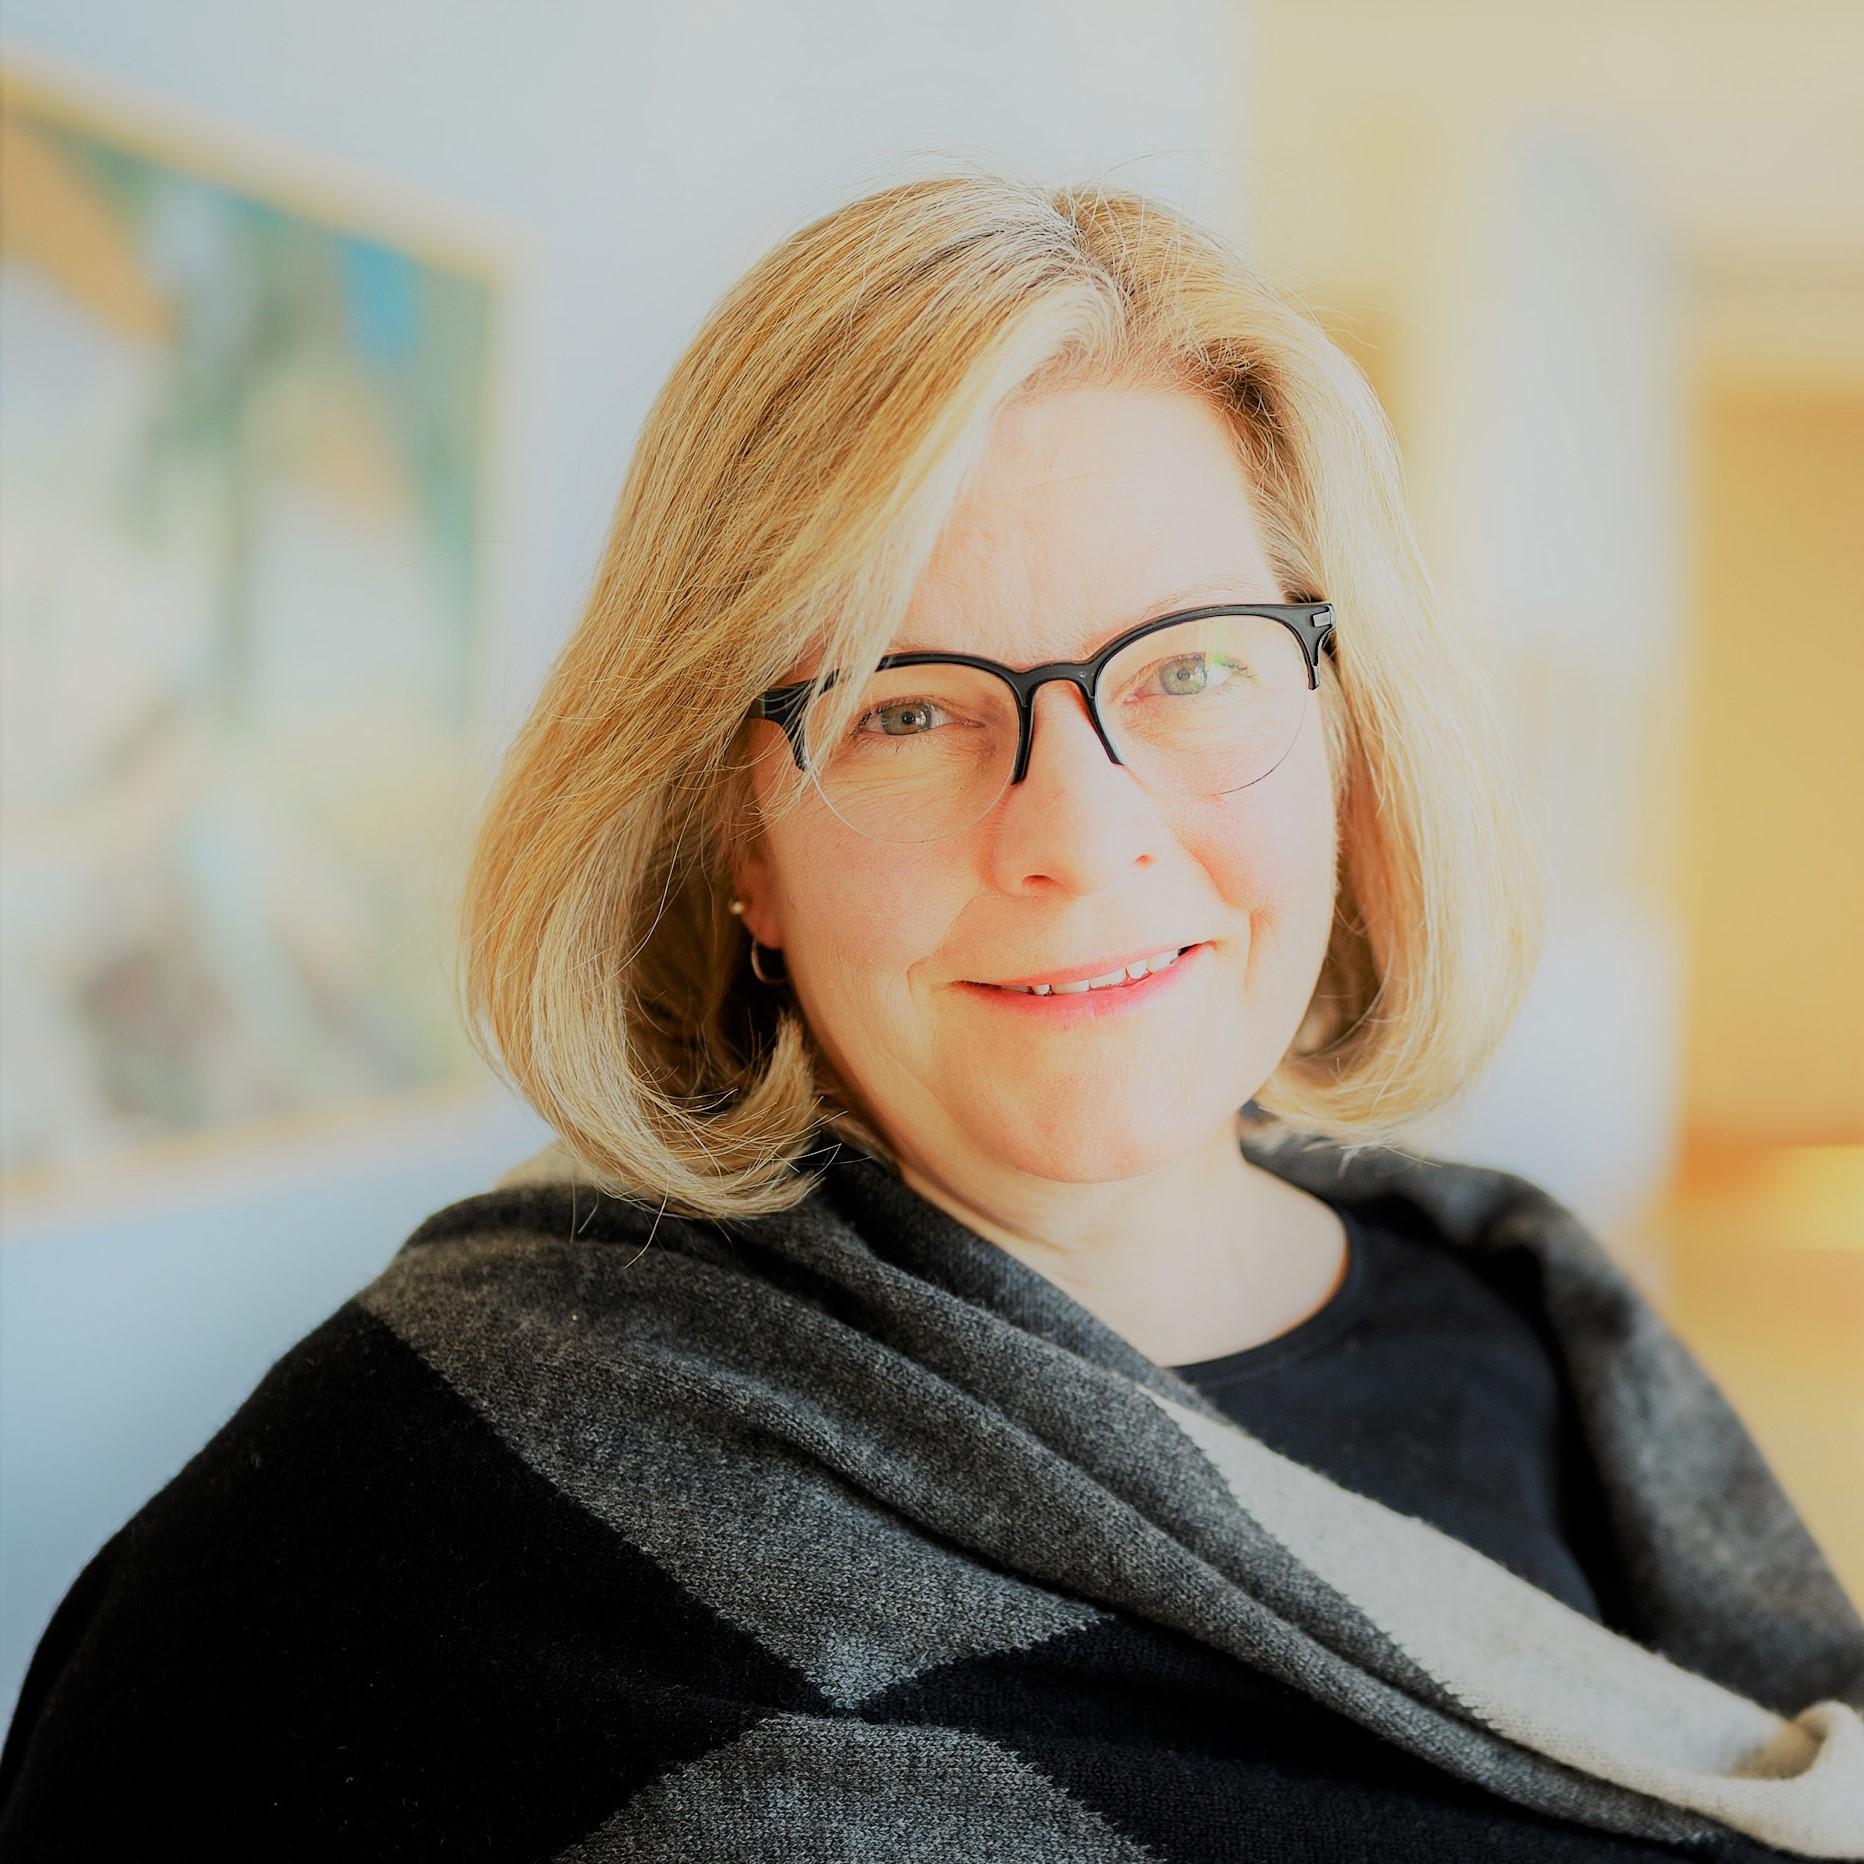 carey business school Elizabeth McGraw-Austin